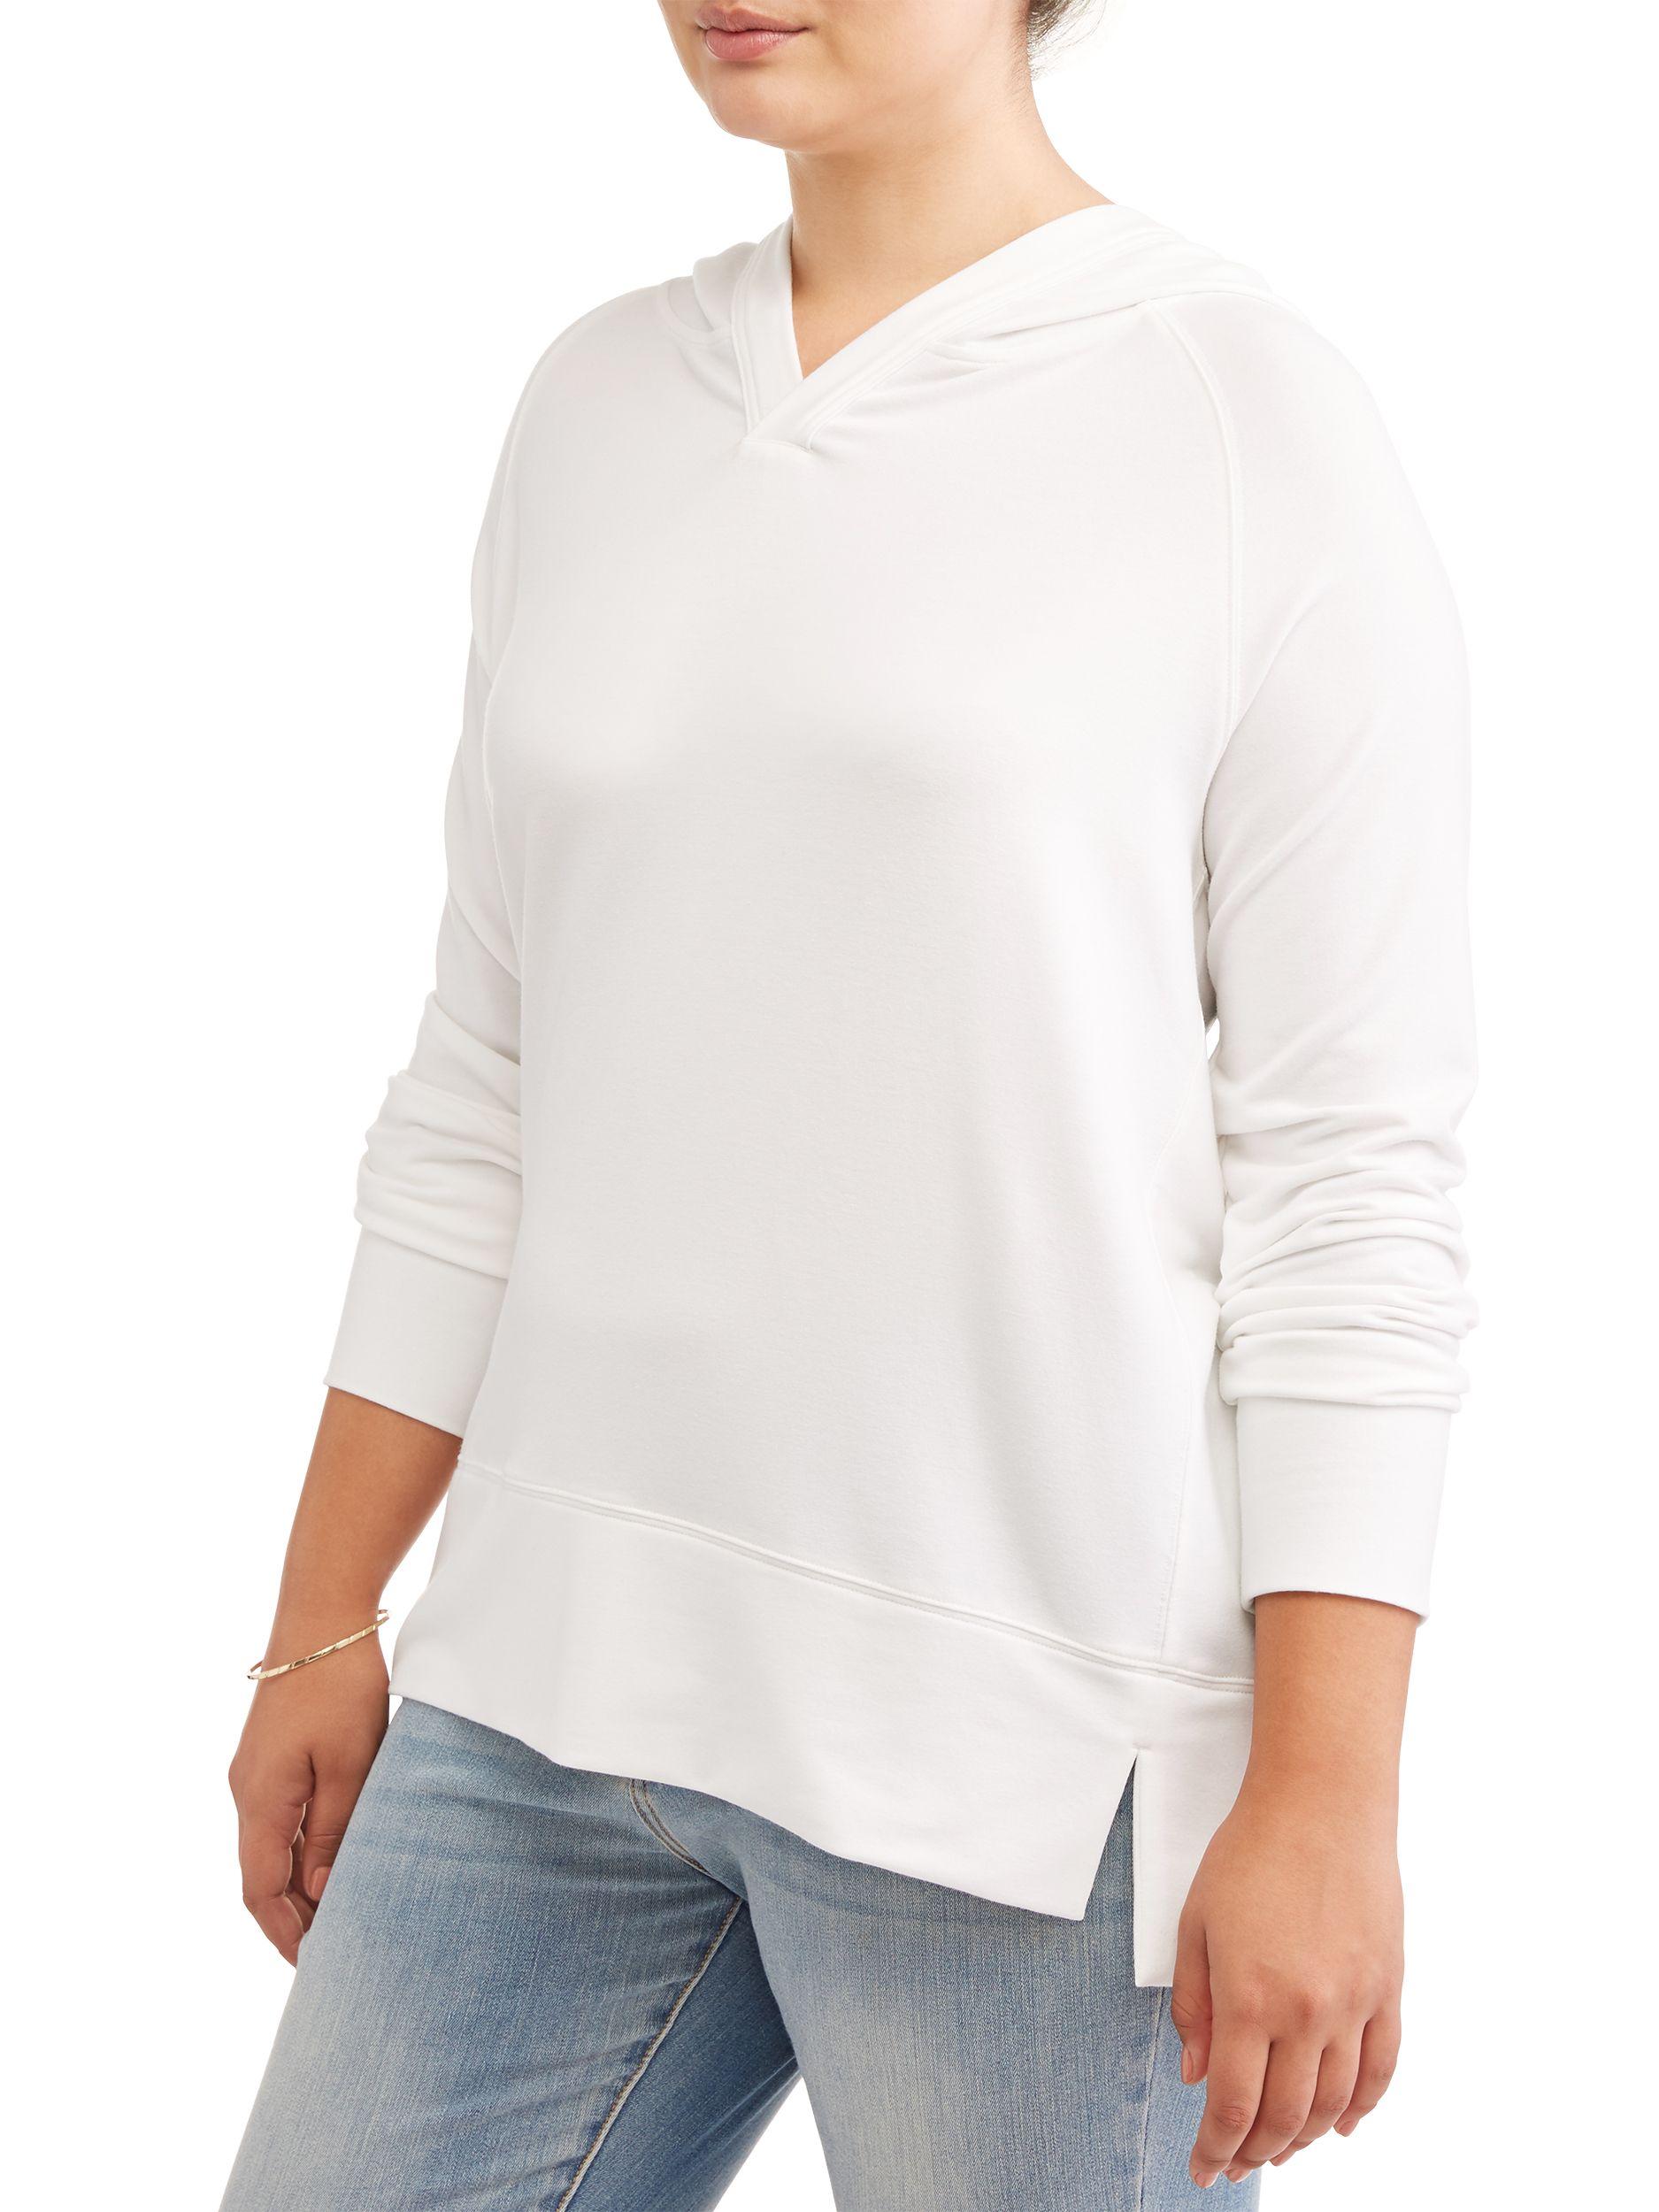 93726077b9c Avia Women's Plus Size Hooded Tunic Sweatshirt#Size, #Women, #Avia ...